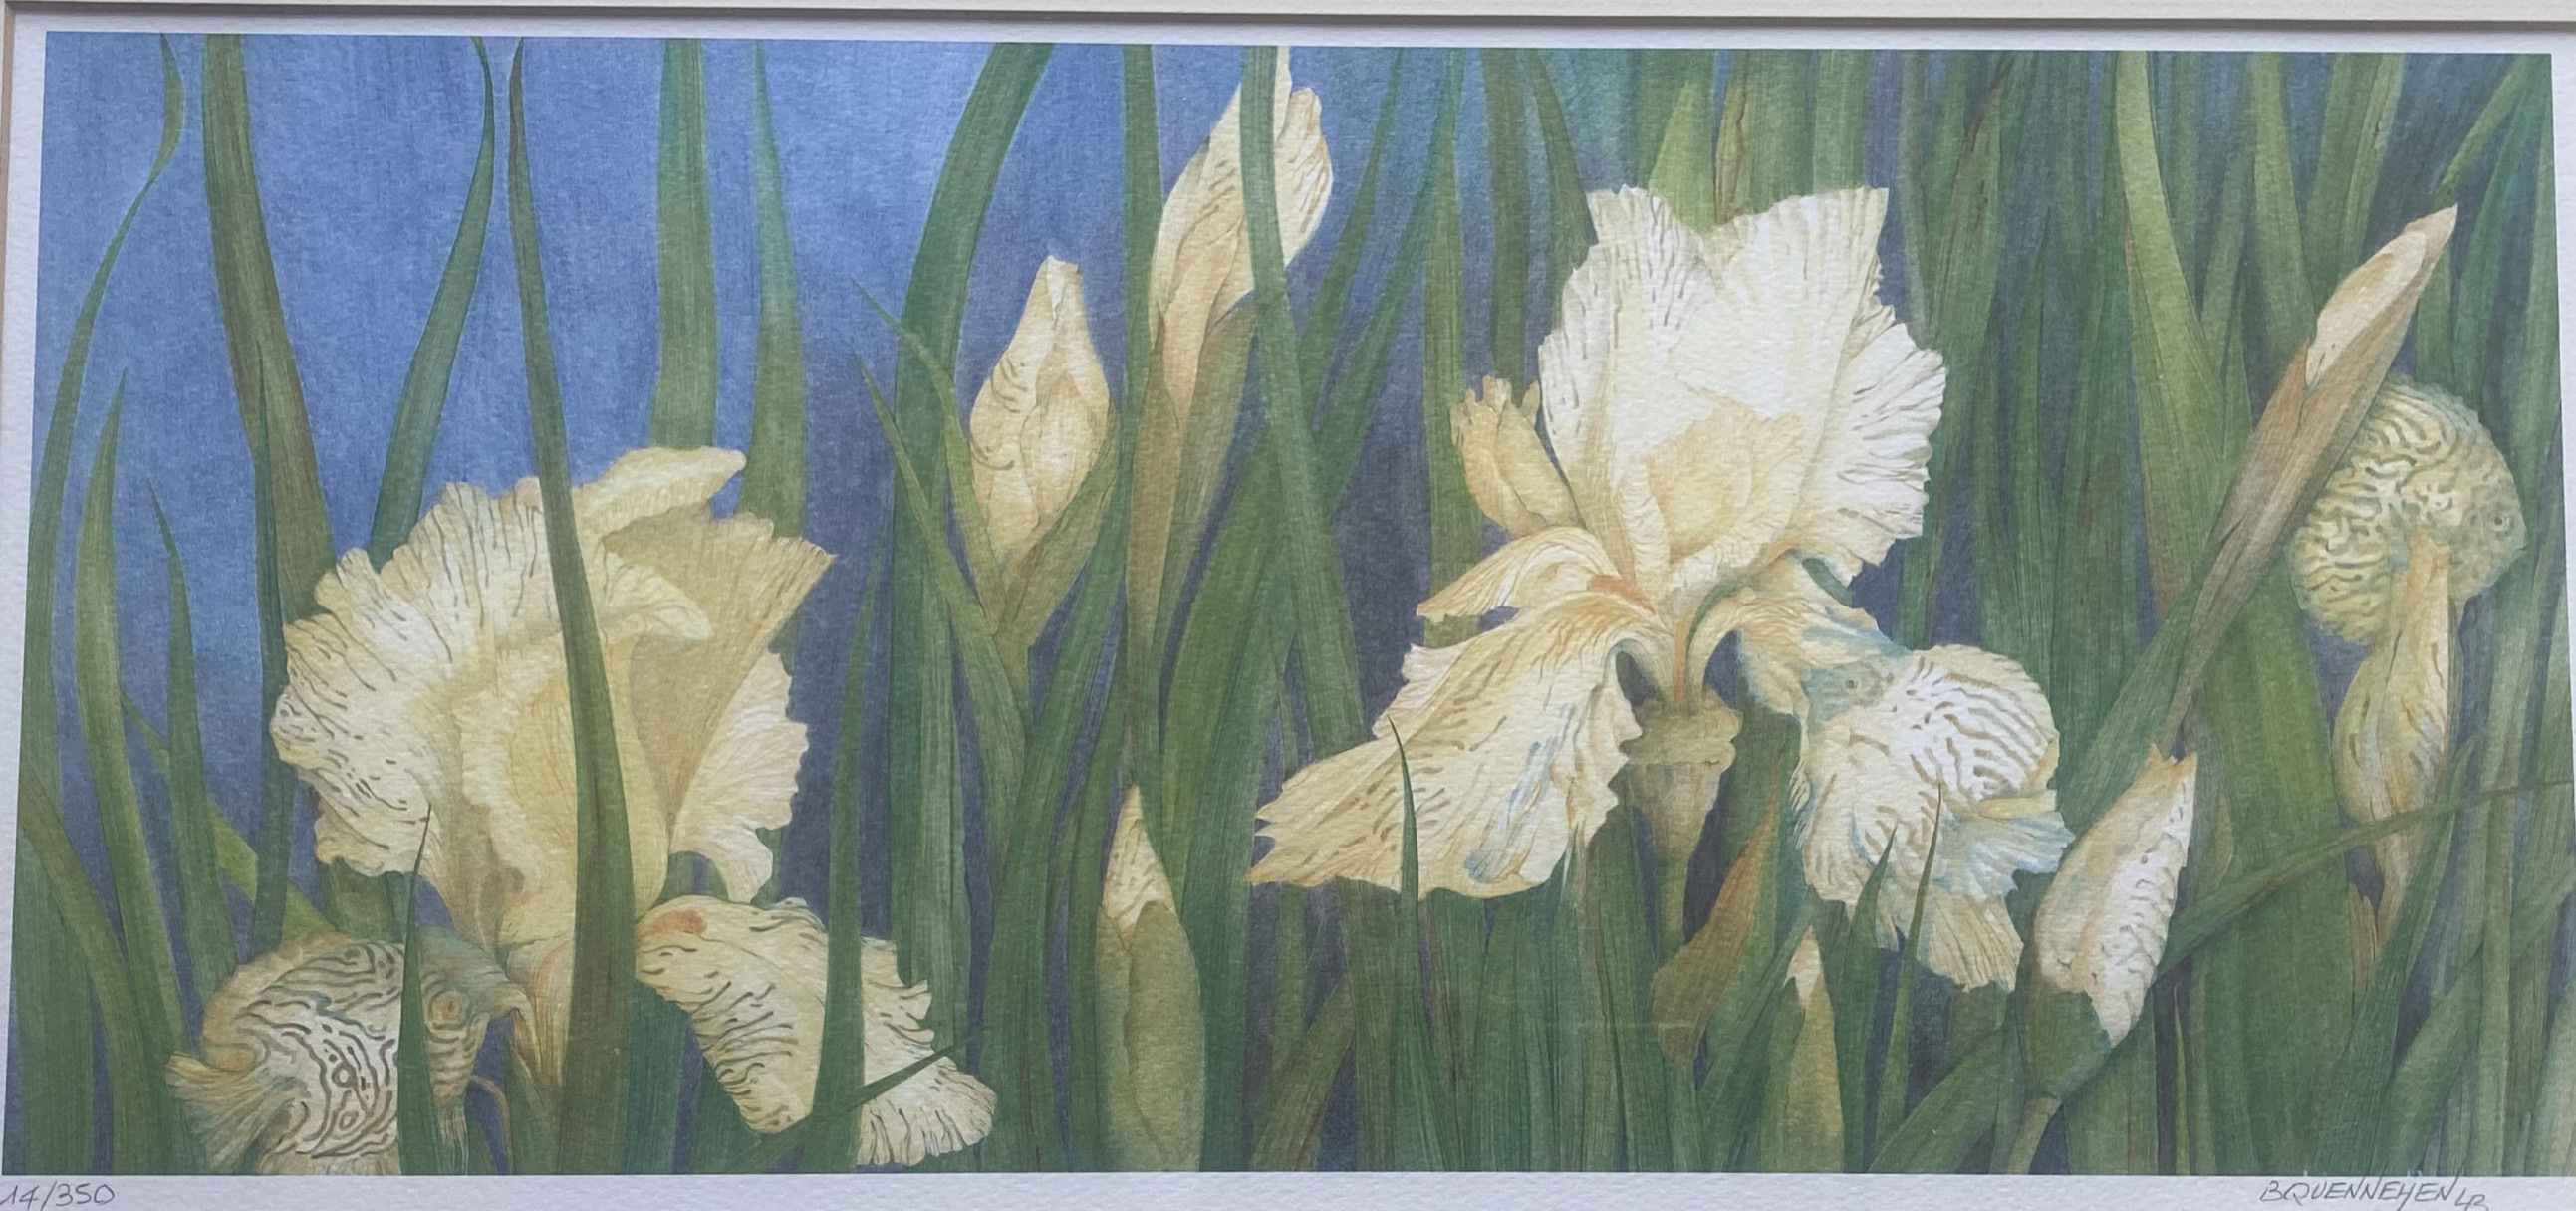 Brigitte Quennehen floral art print Discus